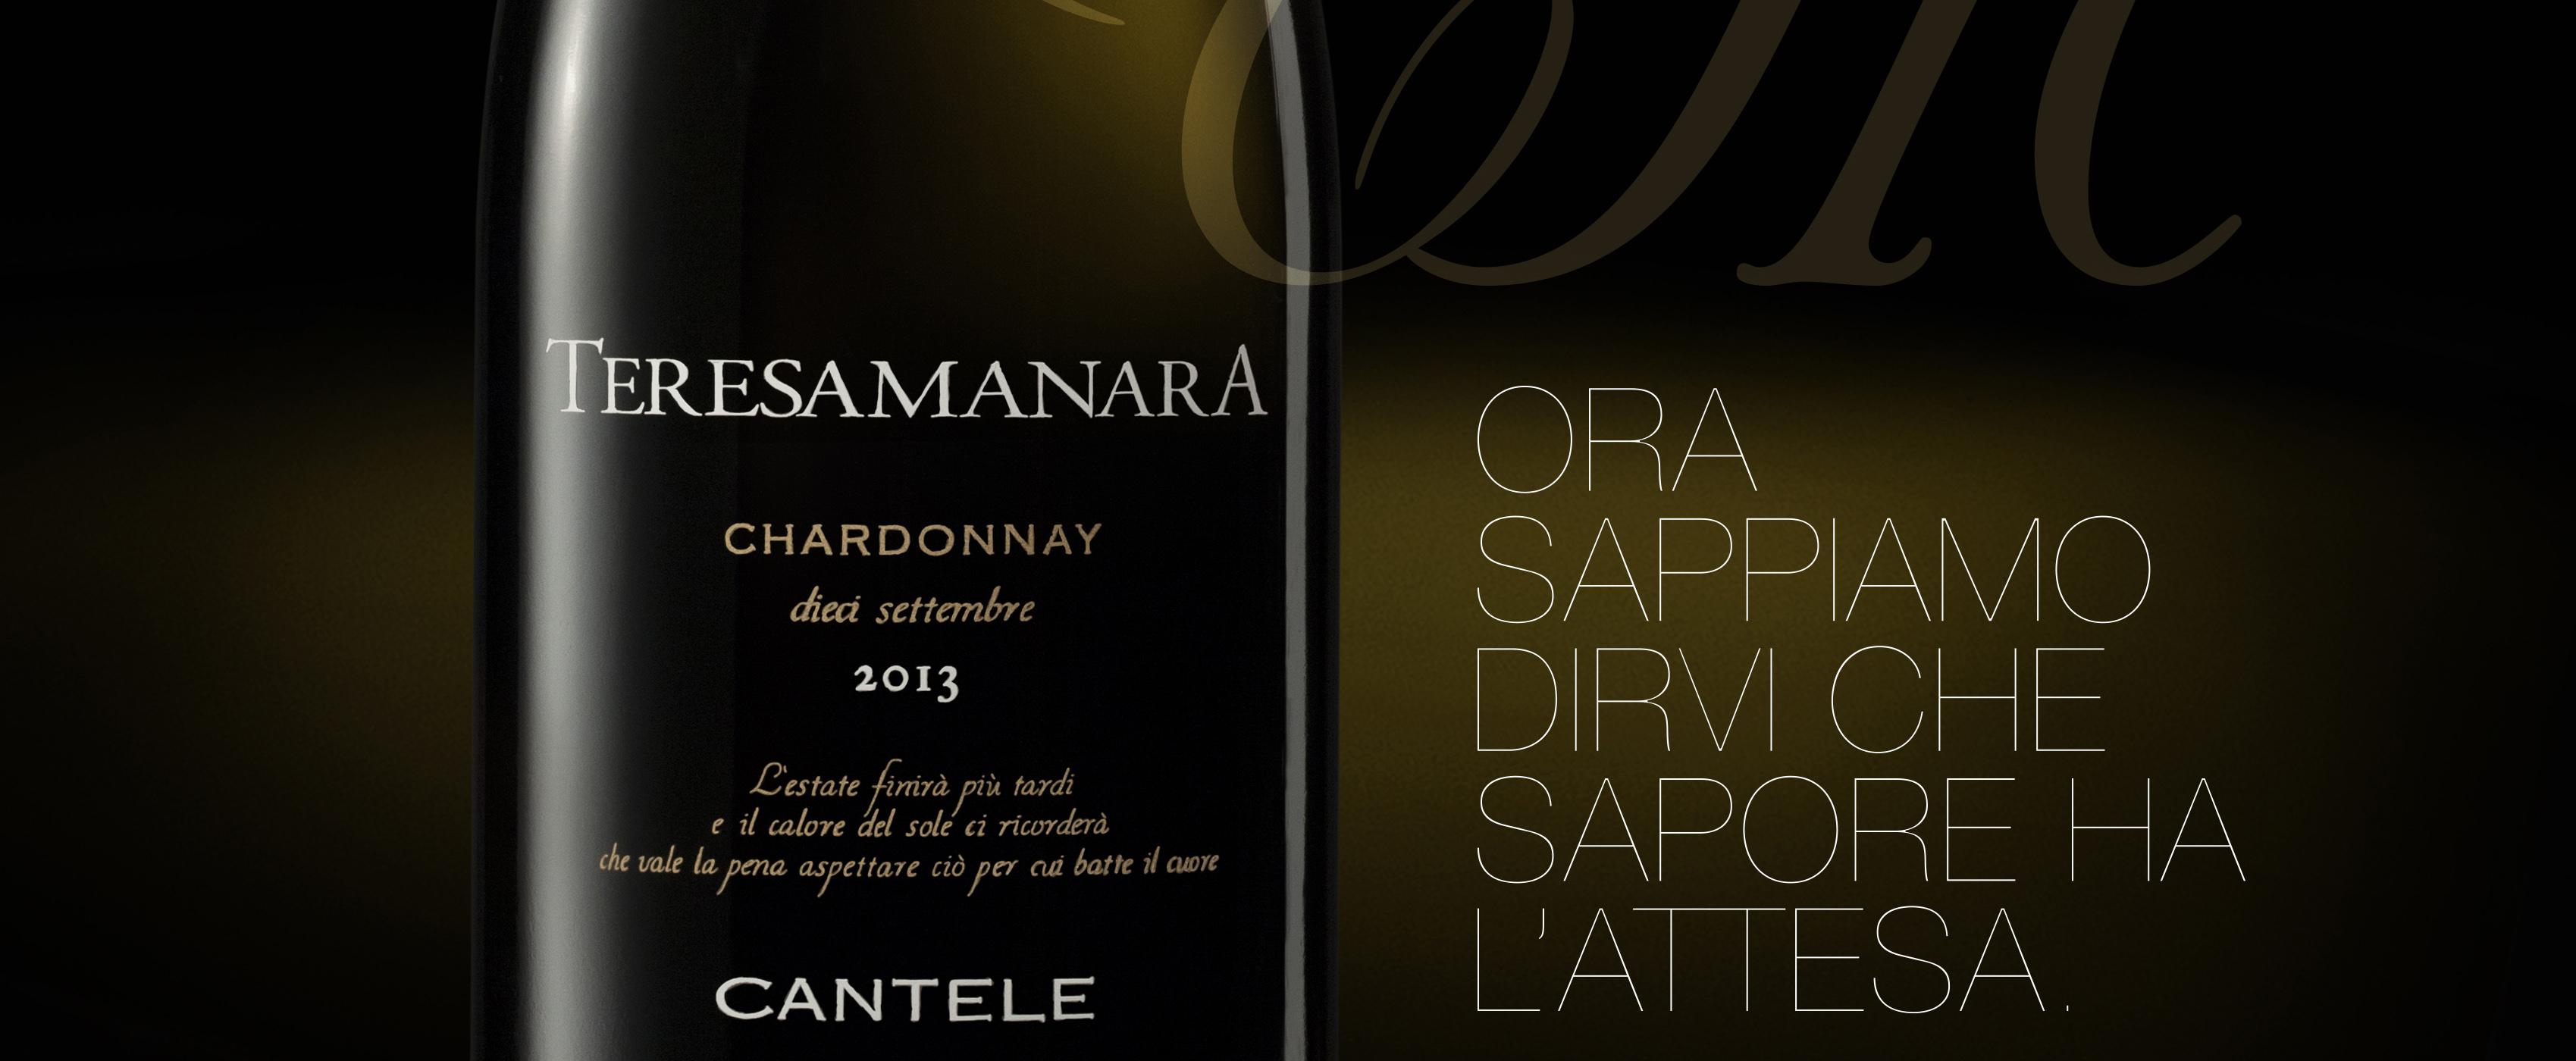 "Teresa Manara Chardonnay ""Dieci Settembre"""